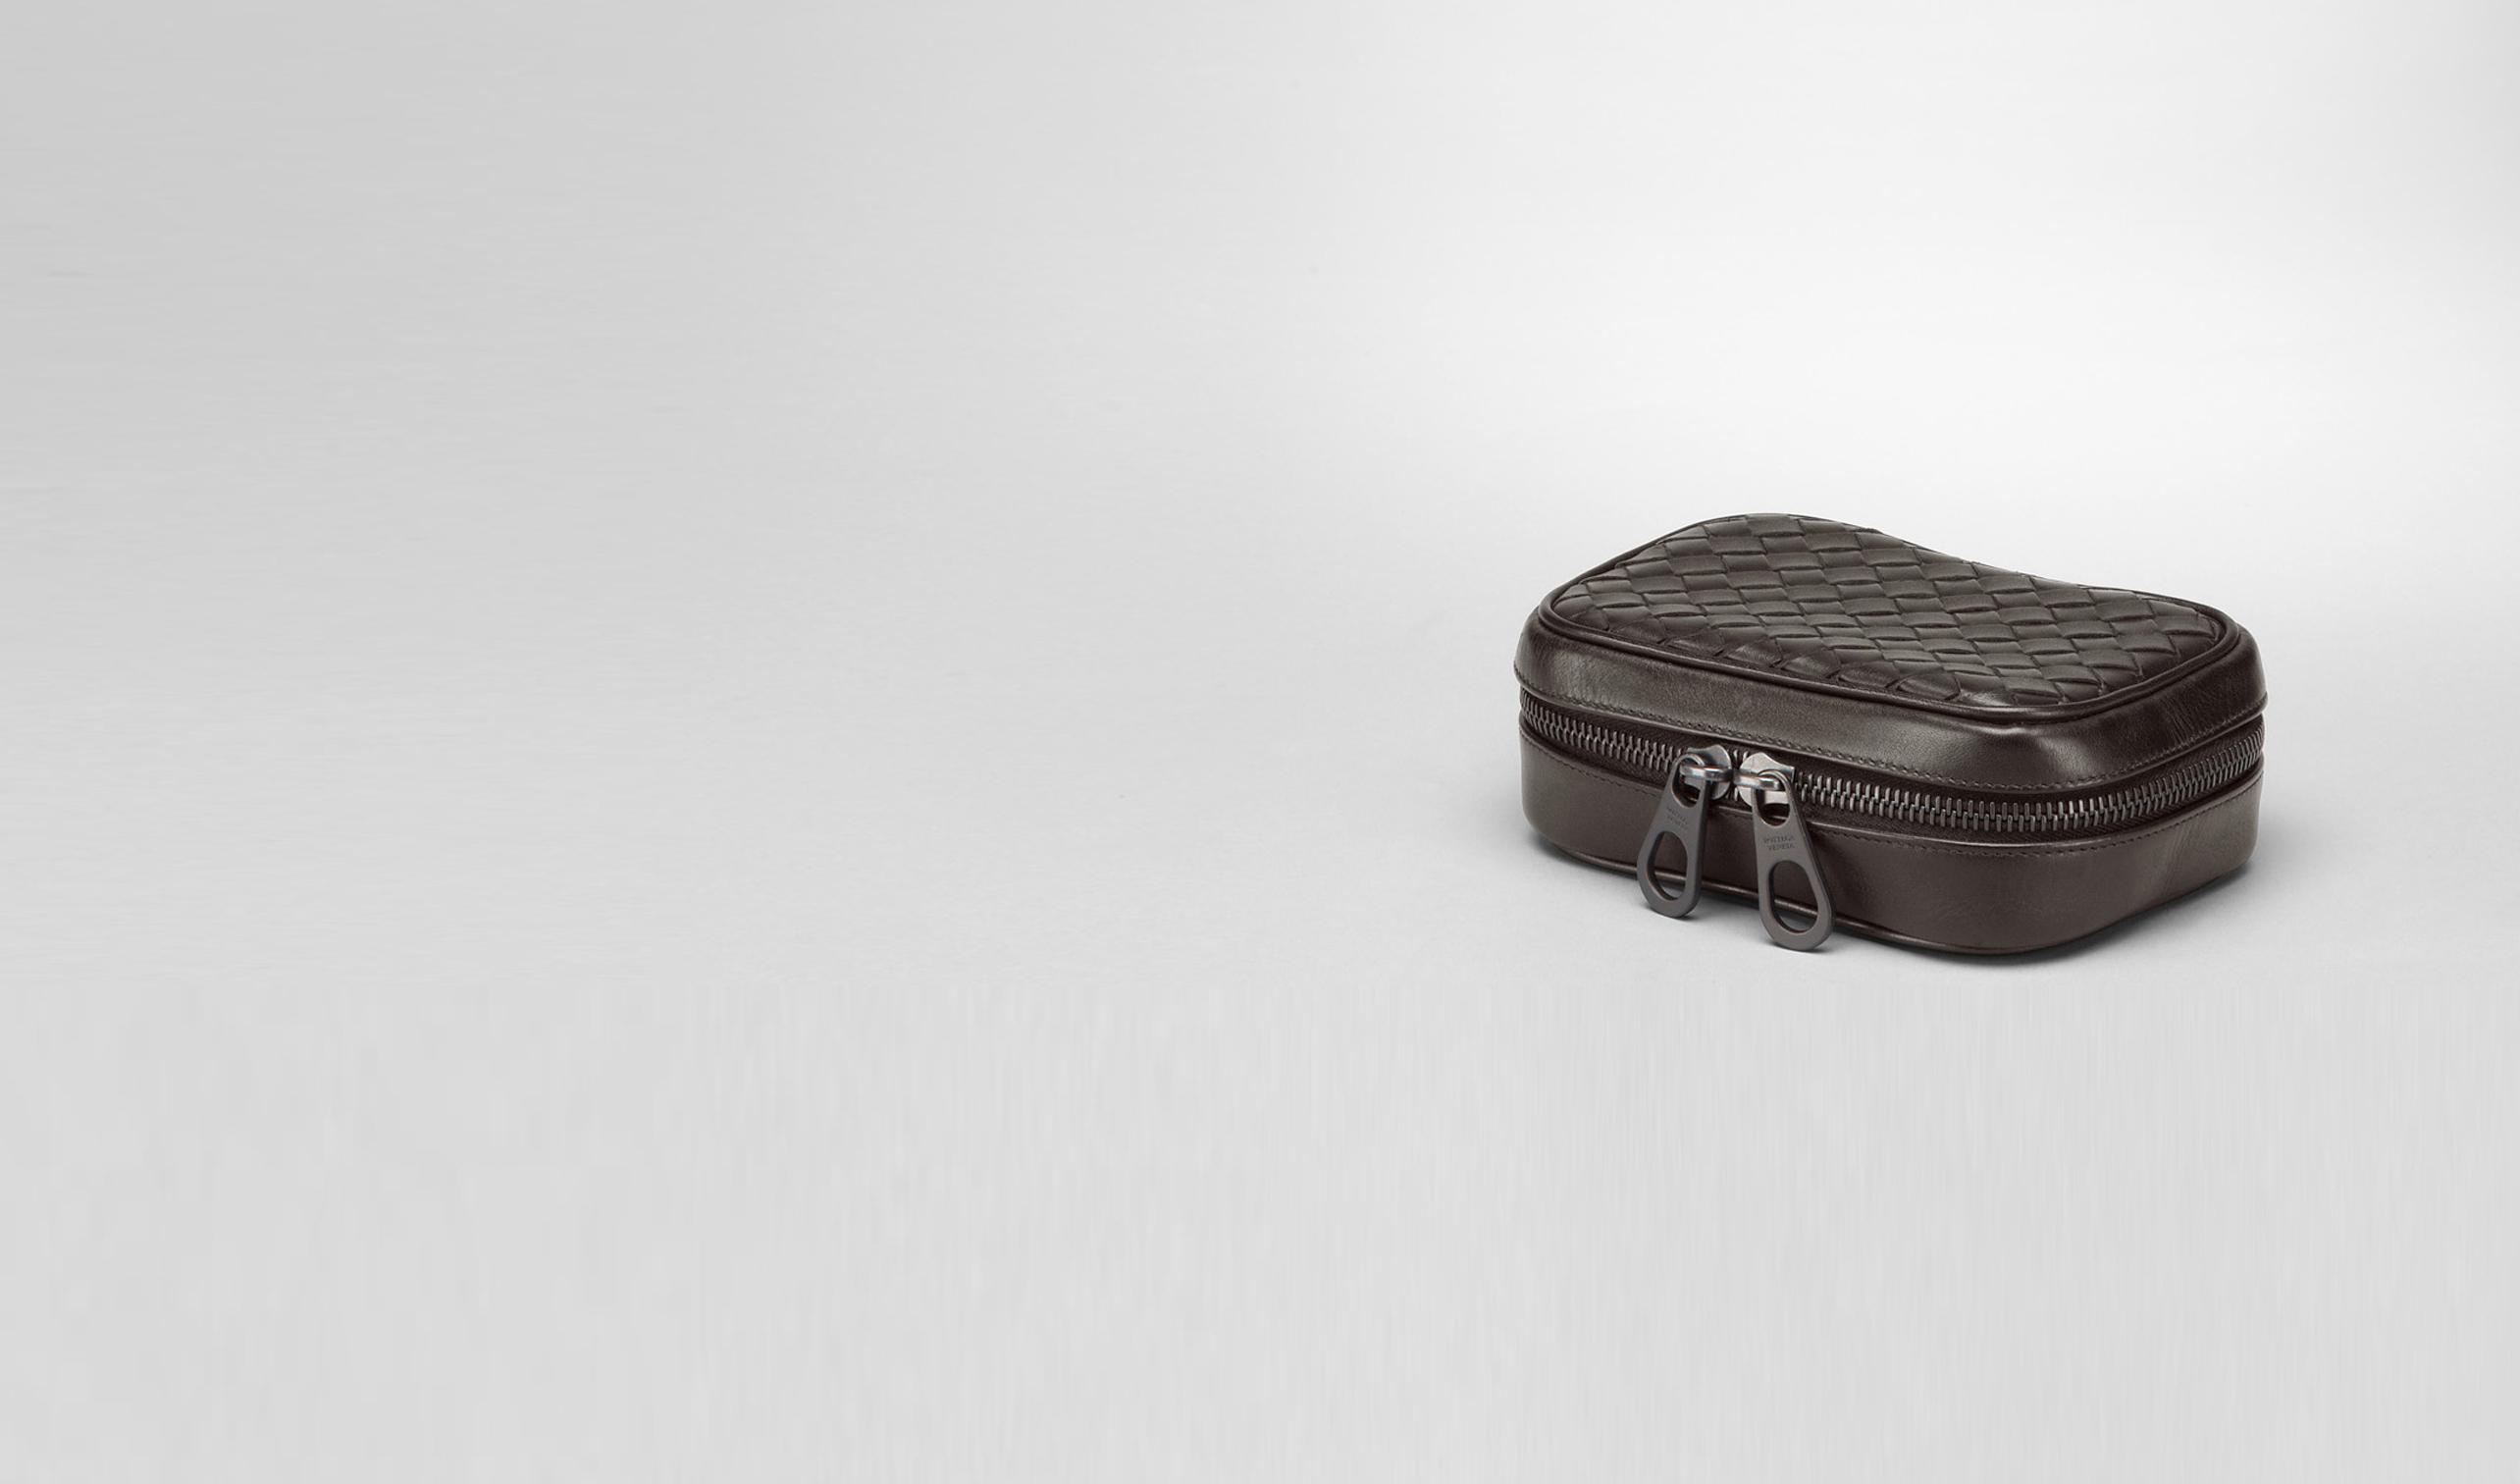 BOTTEGA VENETA Other Leather Accessory U Ebano Intrecciato VN Cufflink Case pl